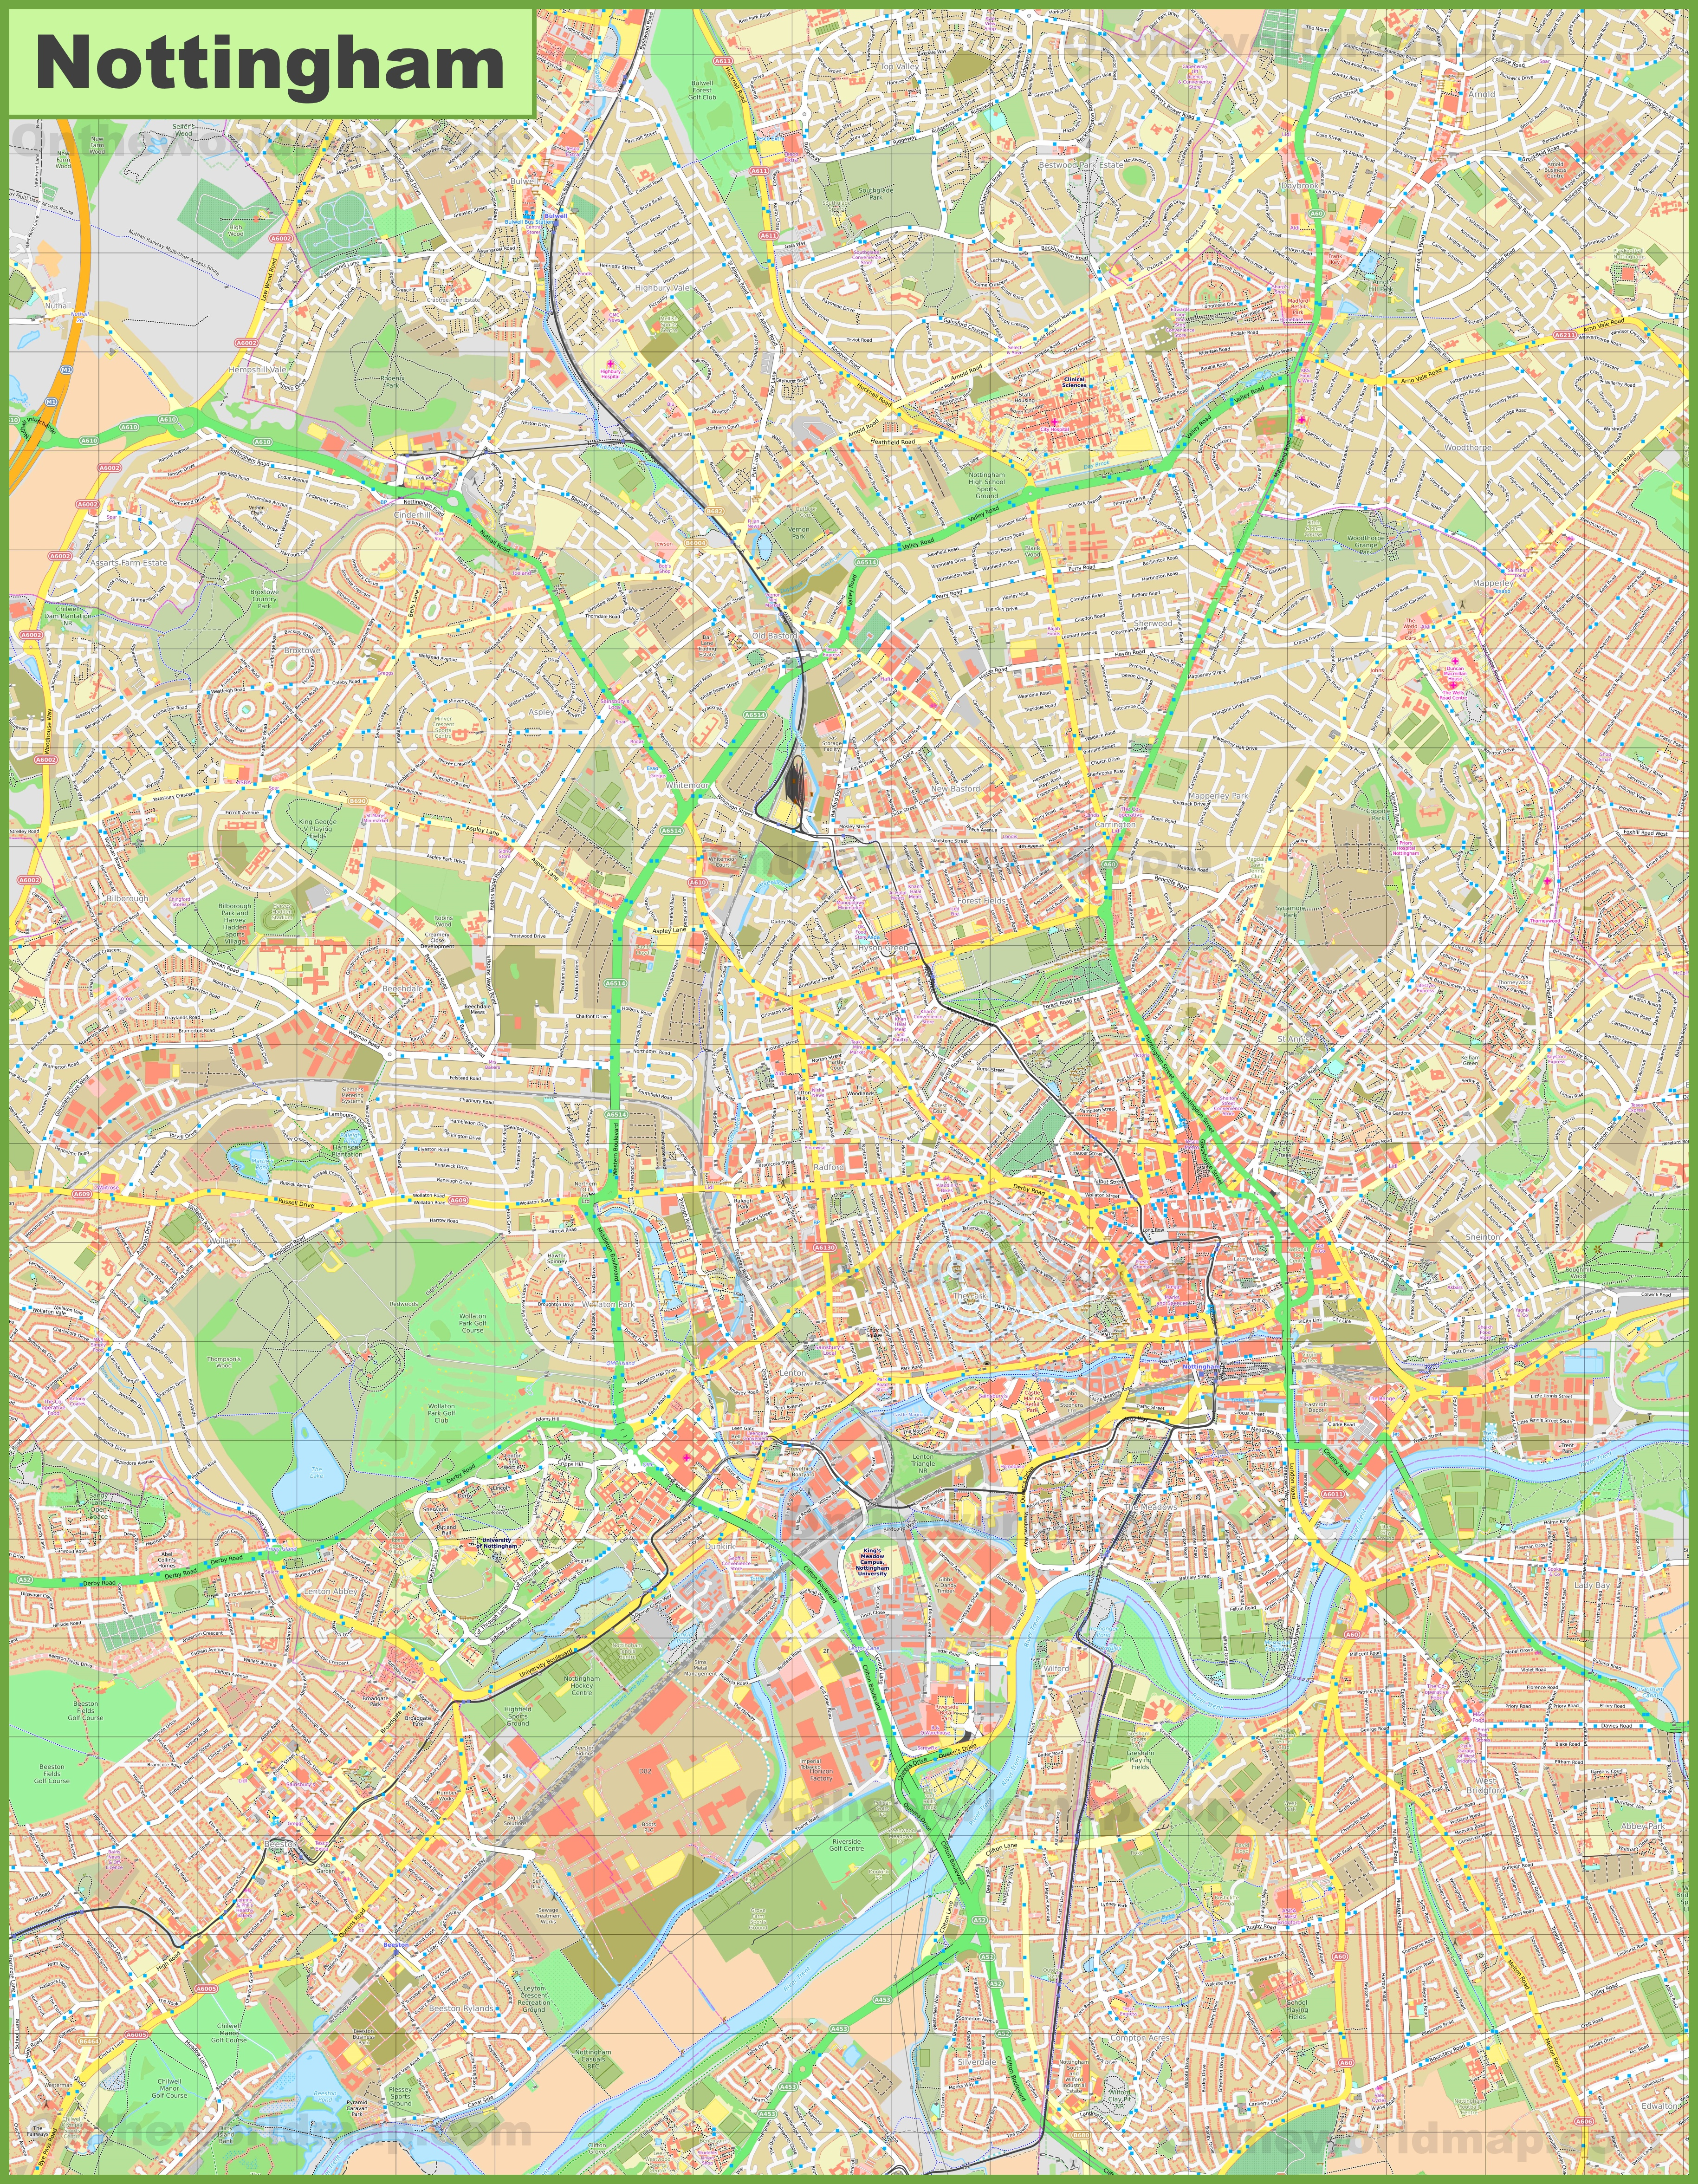 Detailed map of Nottingham